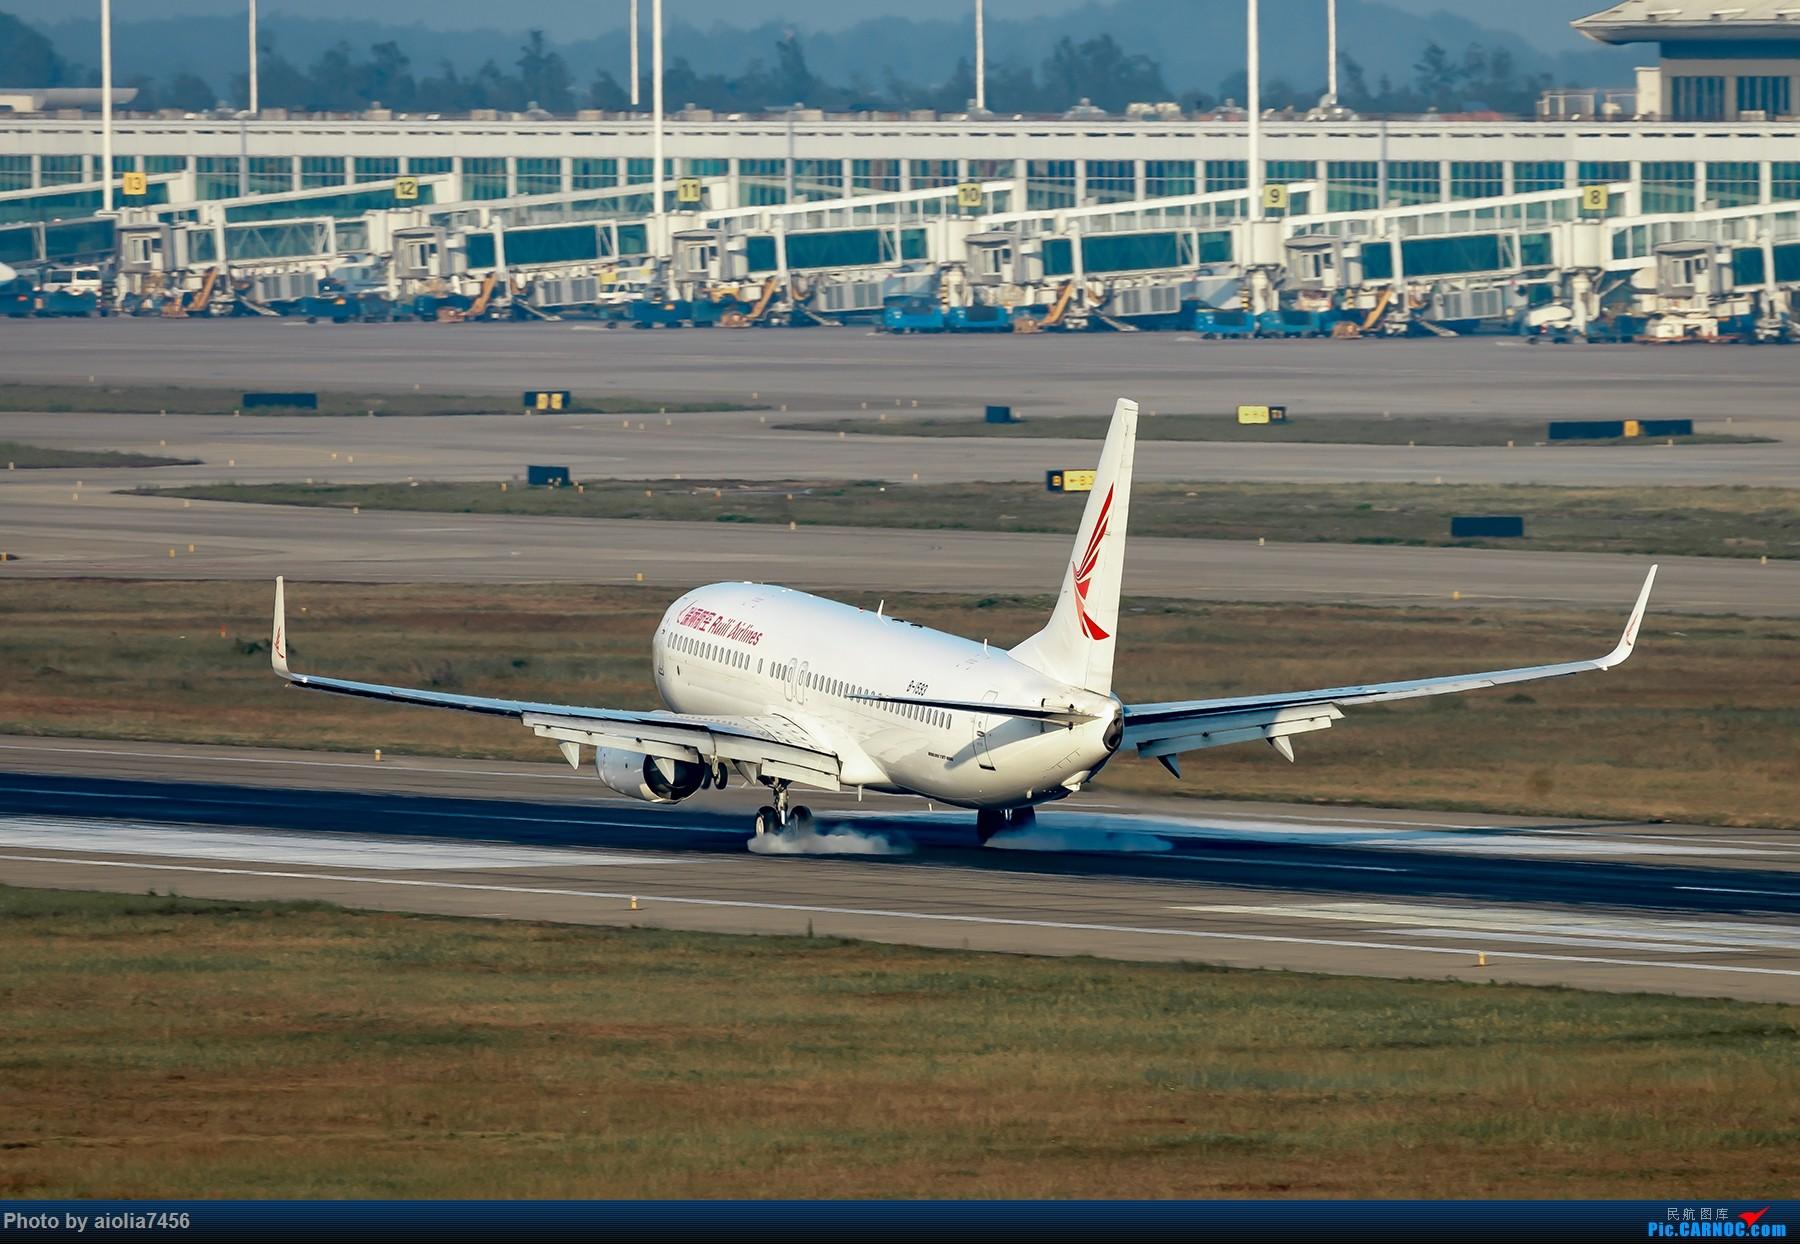 Re:[原创]【福州飞友会】【合肥飞友会】最最难忘的FOC的那一抹蓝 BOEING 737-800 B-1593 中国福州长乐国际机场